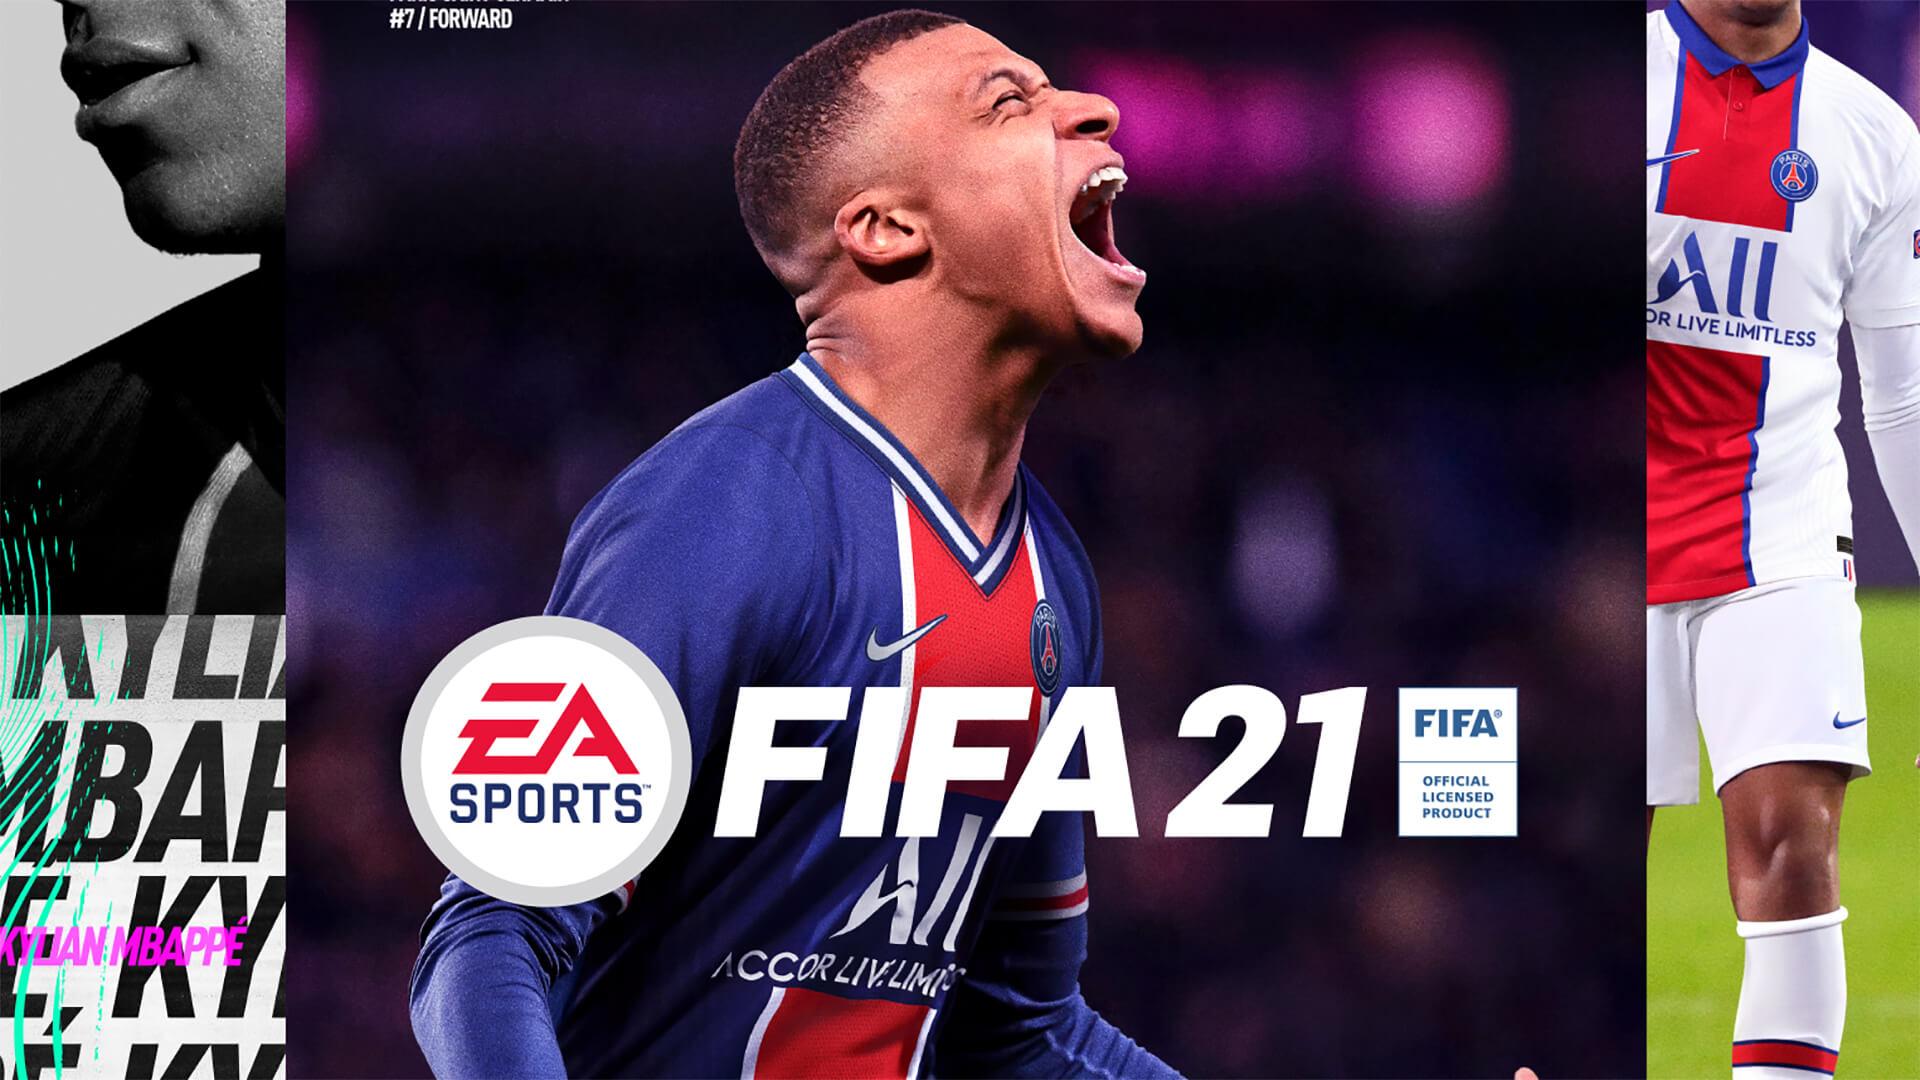 banda sonora de FIFA 21